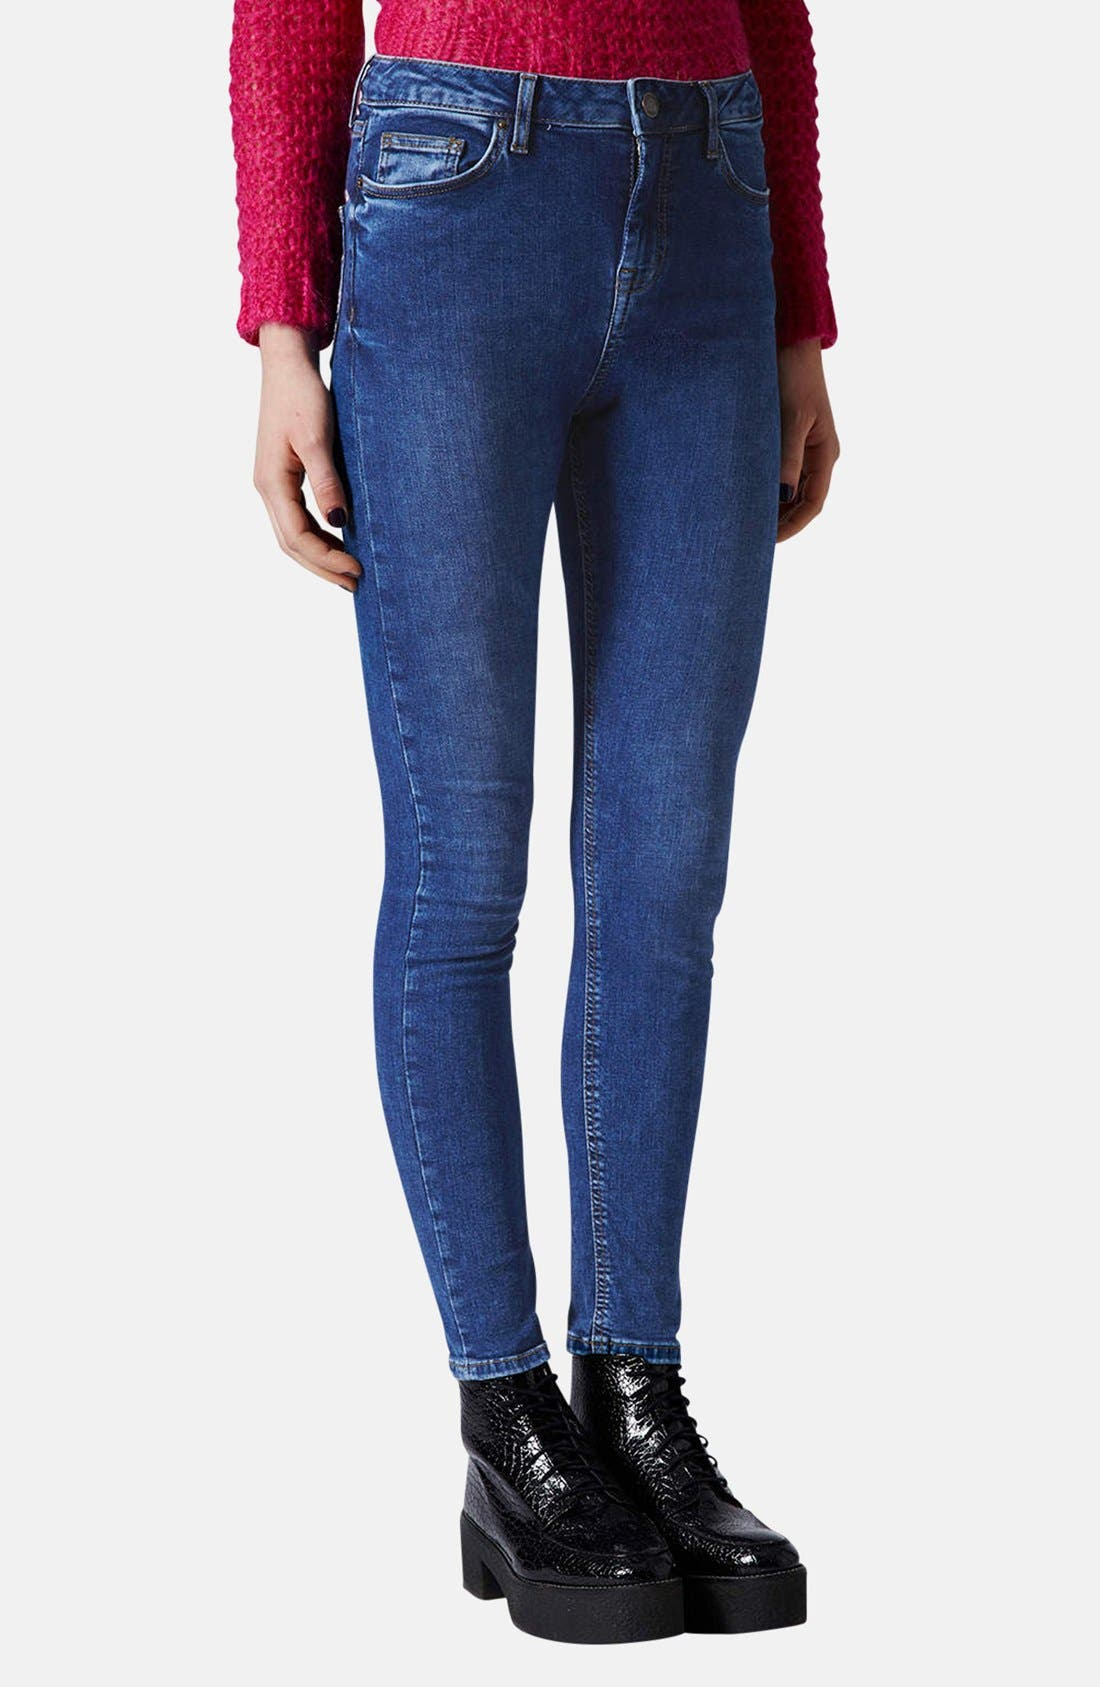 Alternate Image 1 Selected - Topshop Moto 'Jamie' High Rise Skinny Ankle Jeans (Blue) (Regular & Short)